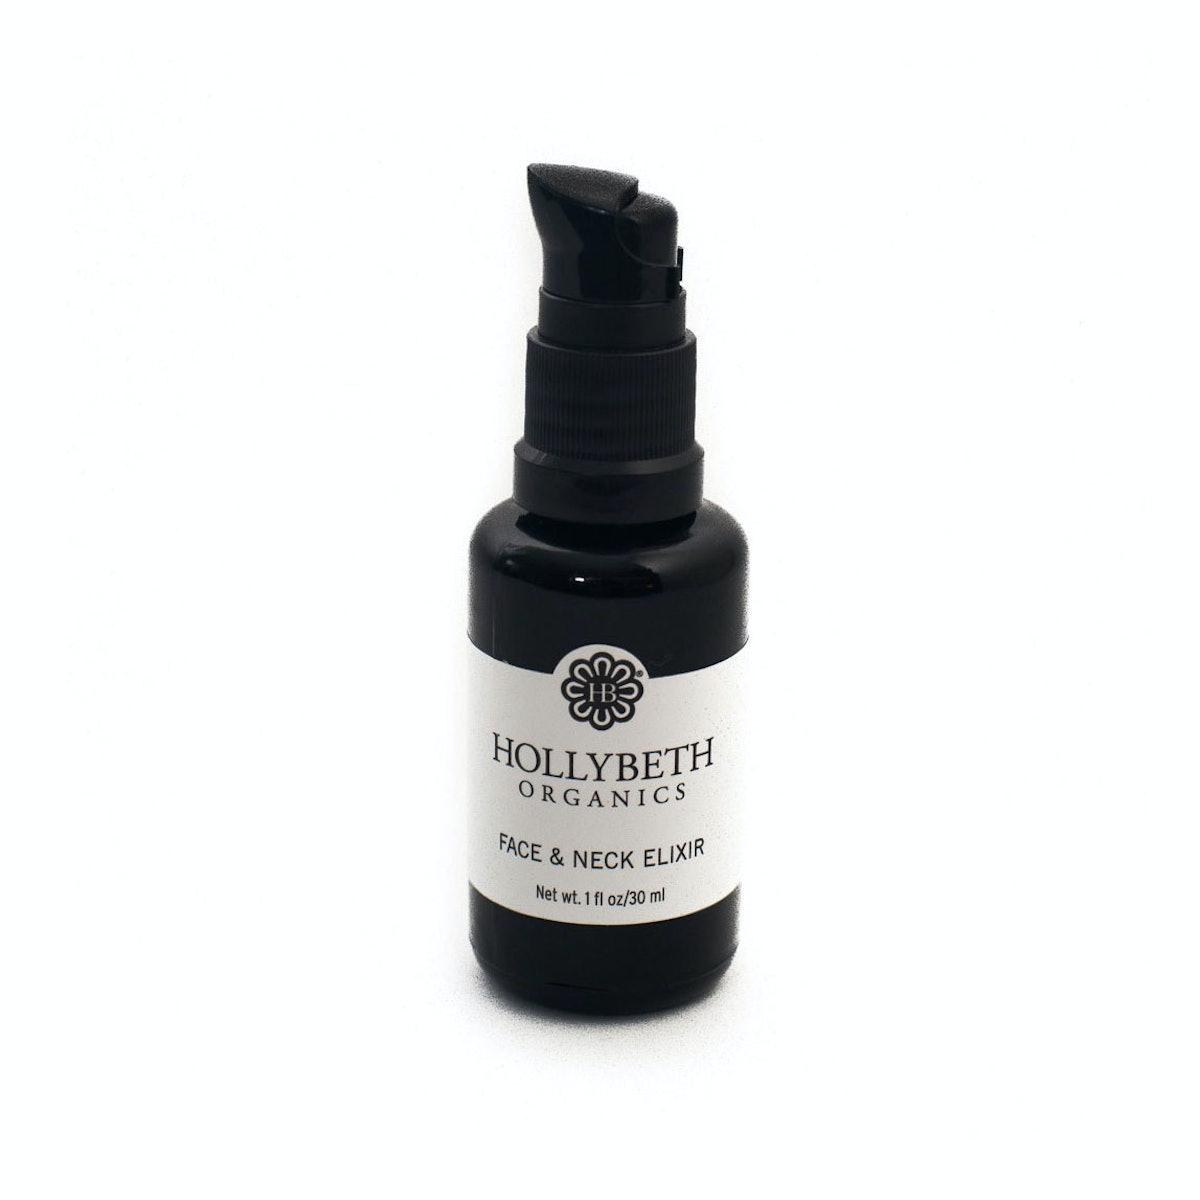 Holly Beth Organics Face & Neck Elixir